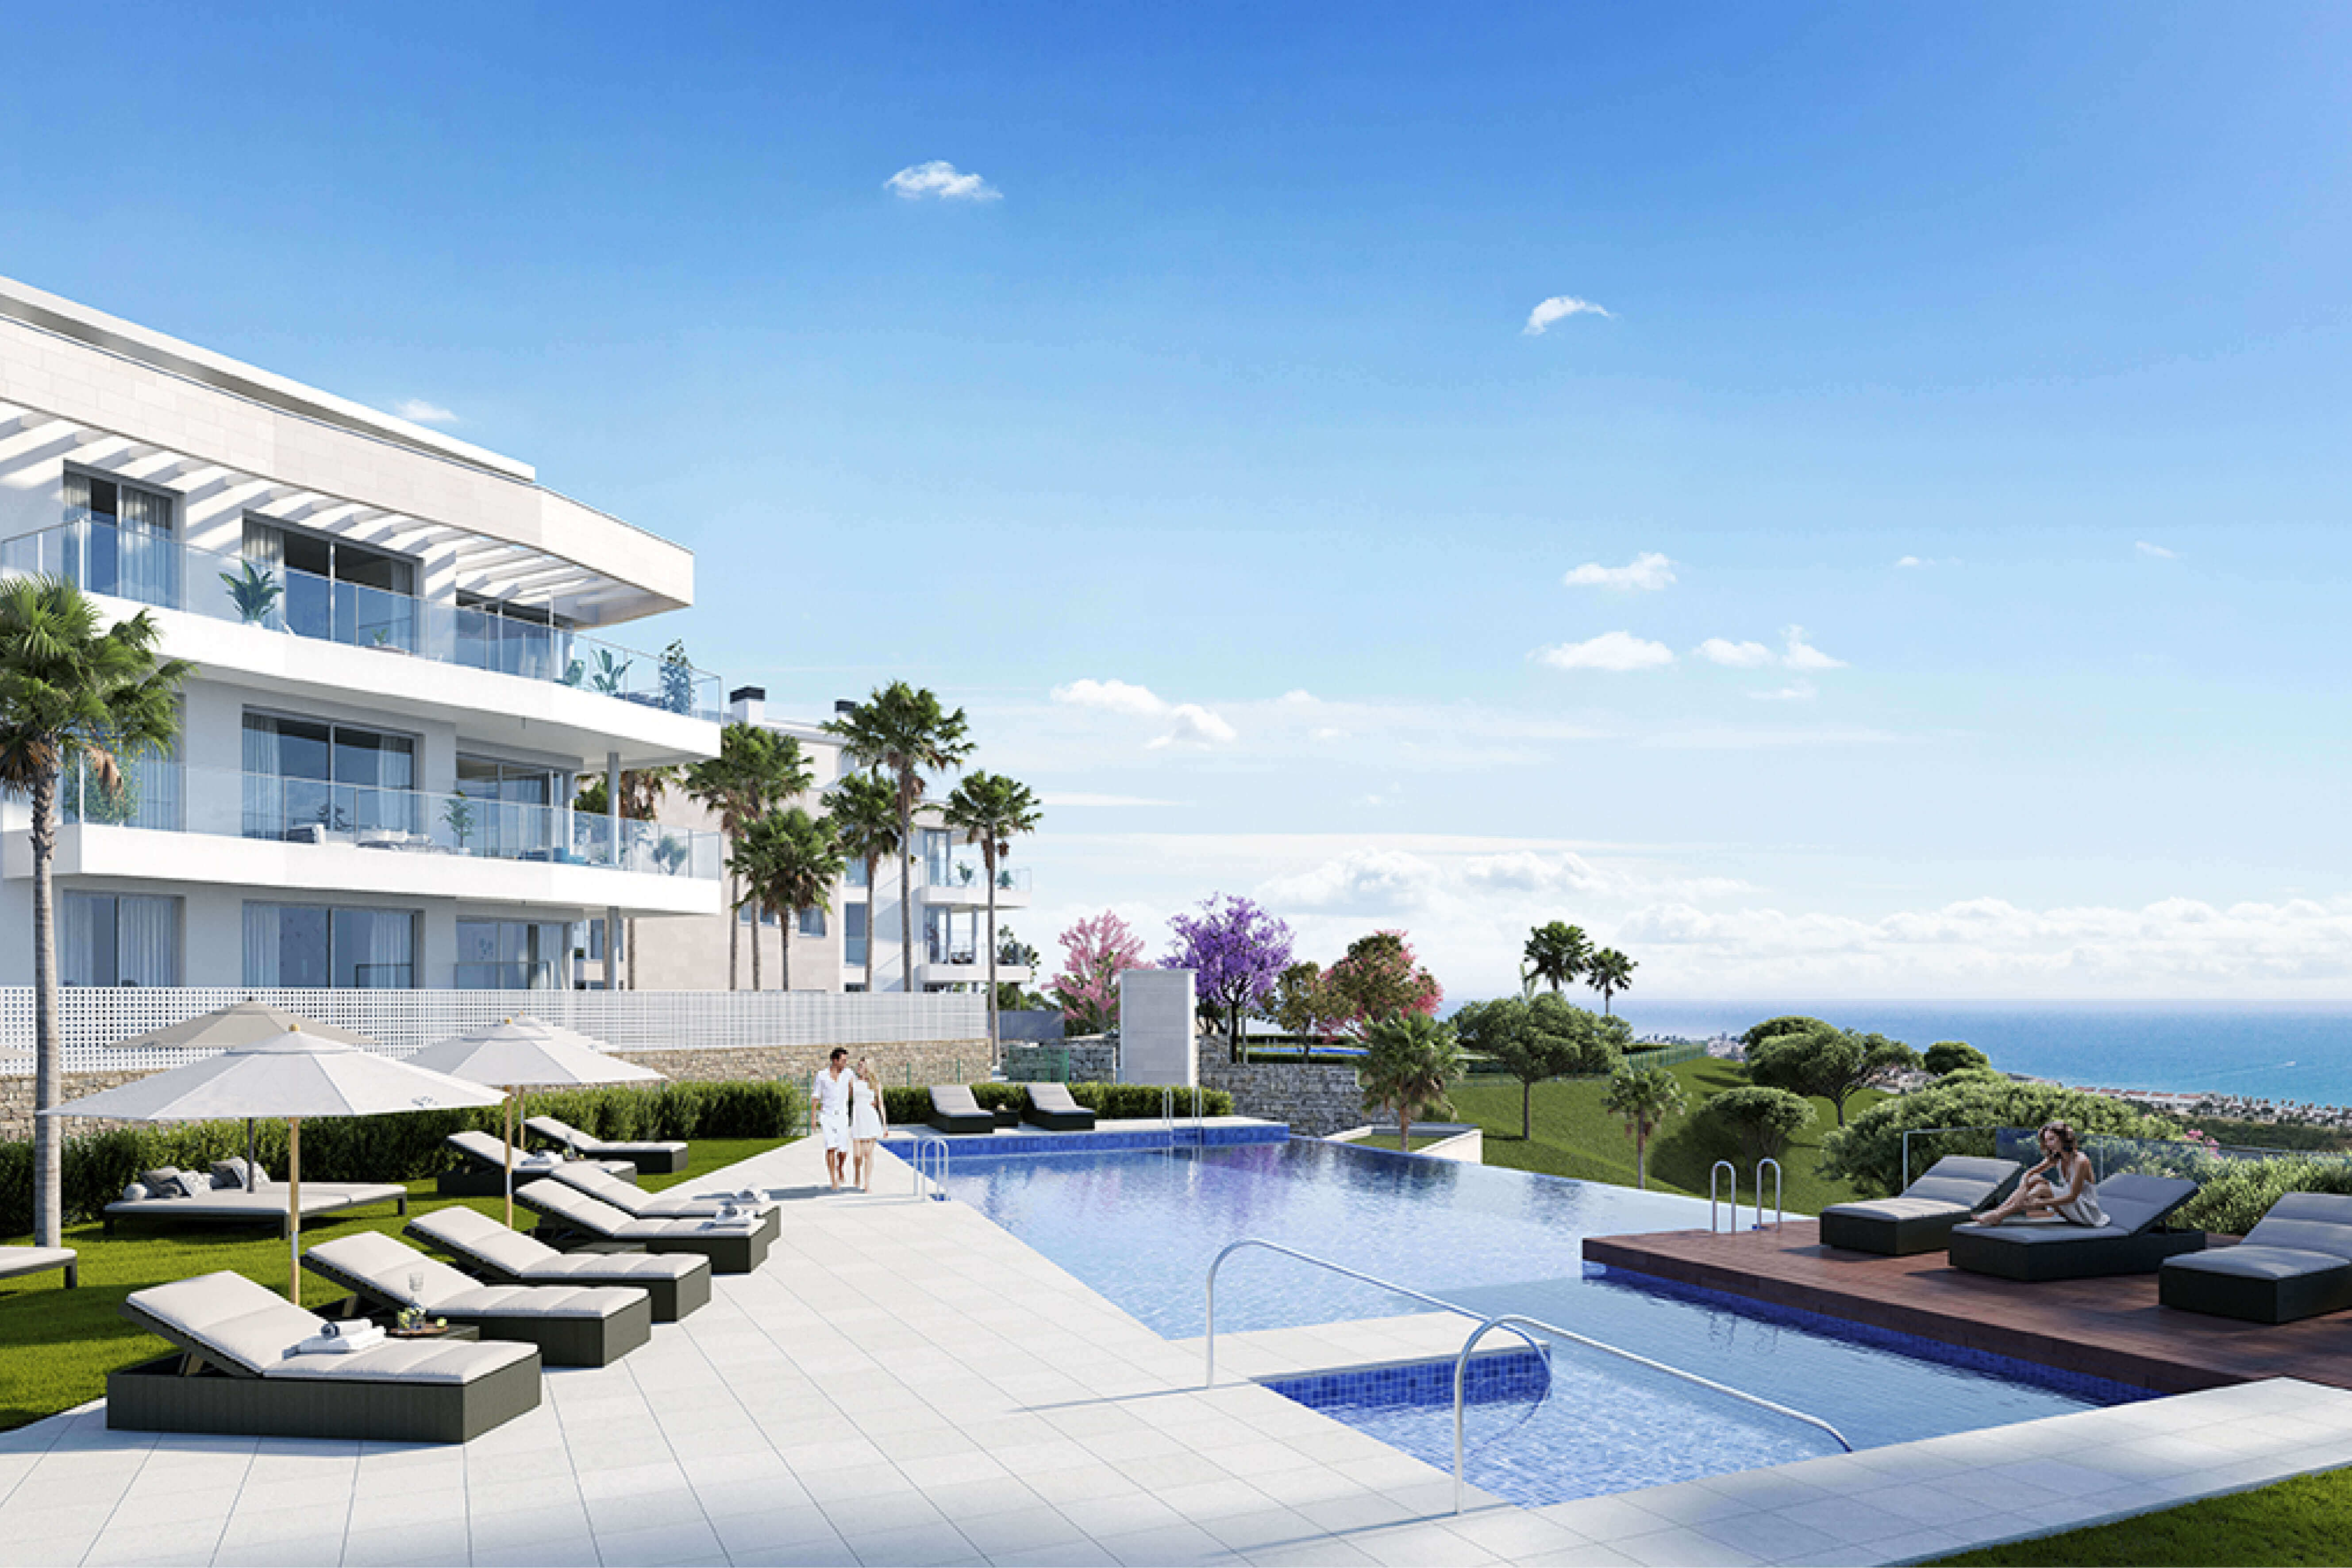 vitta nature mijas oost marbella golf zee chaparral modern nieuwbouw zeezicht